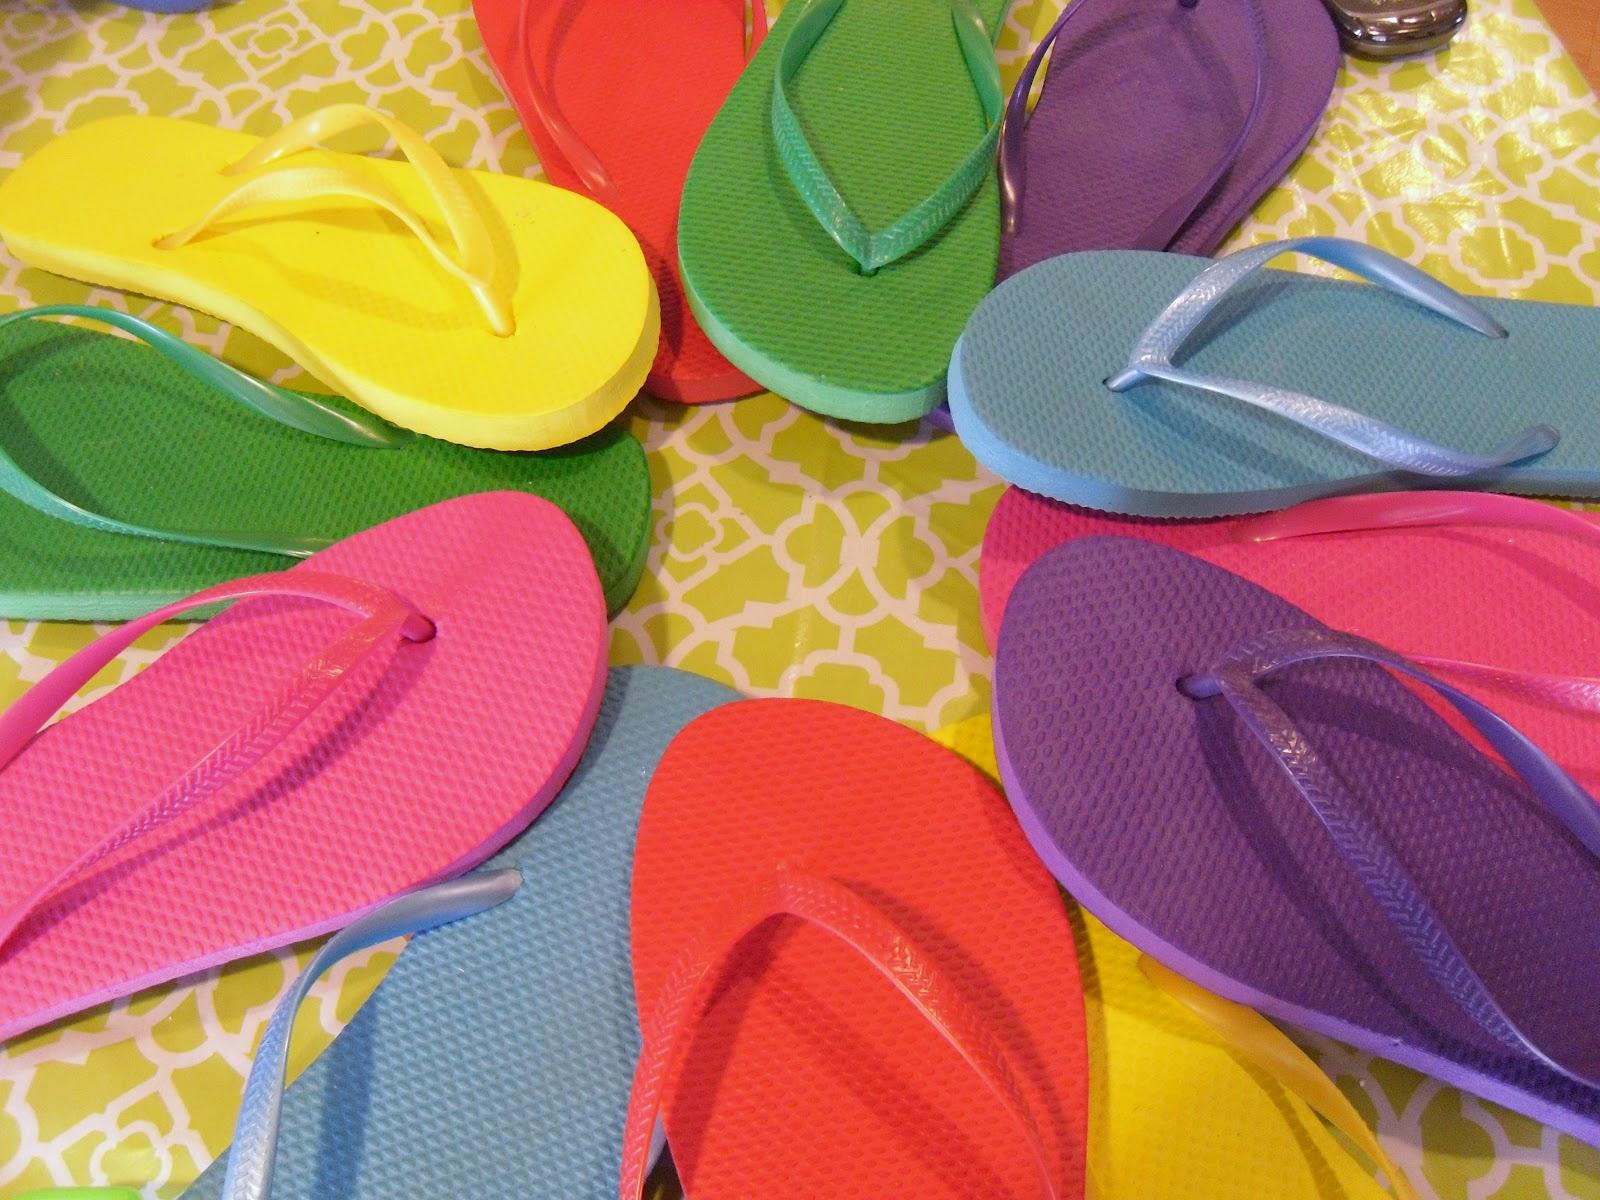 pin decor flop to decorating deocrate how flops ideas flip pinterest